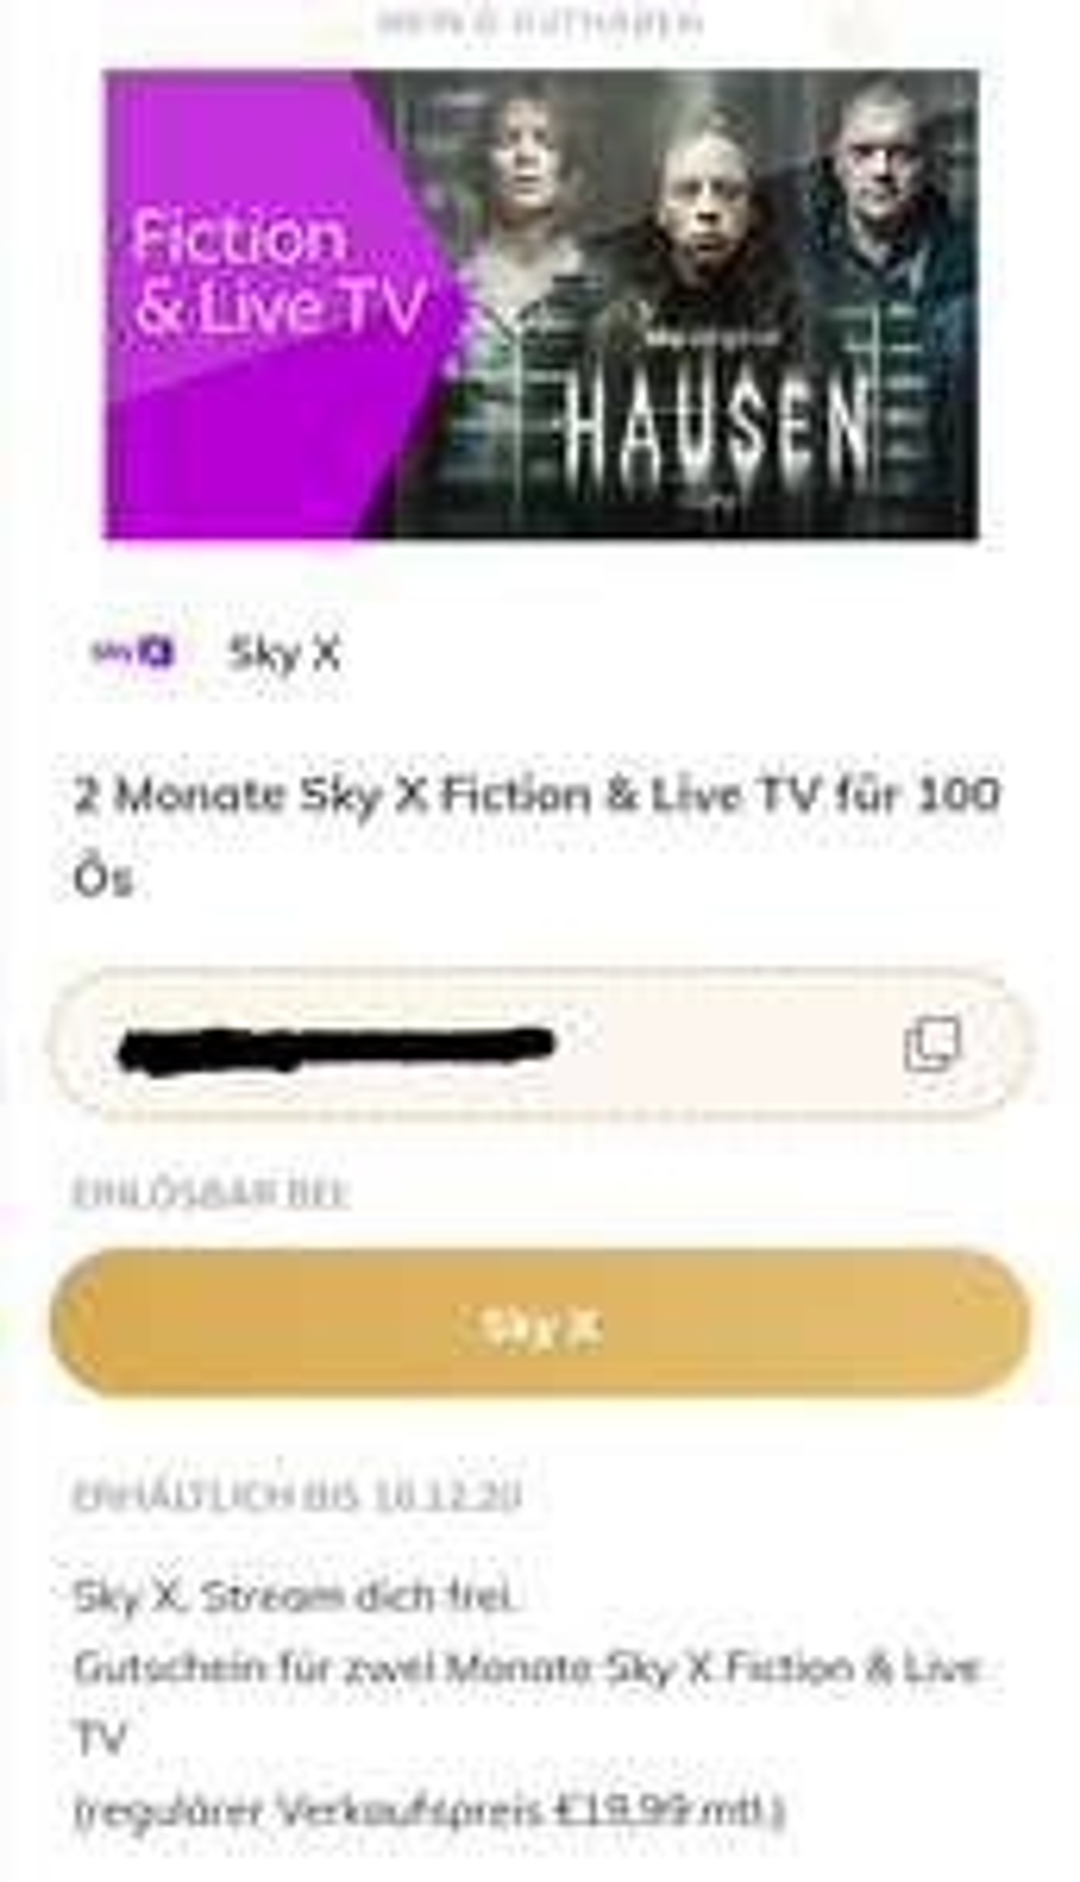 Sky X Fiction & Live TV 2 Monate für 100 Ös